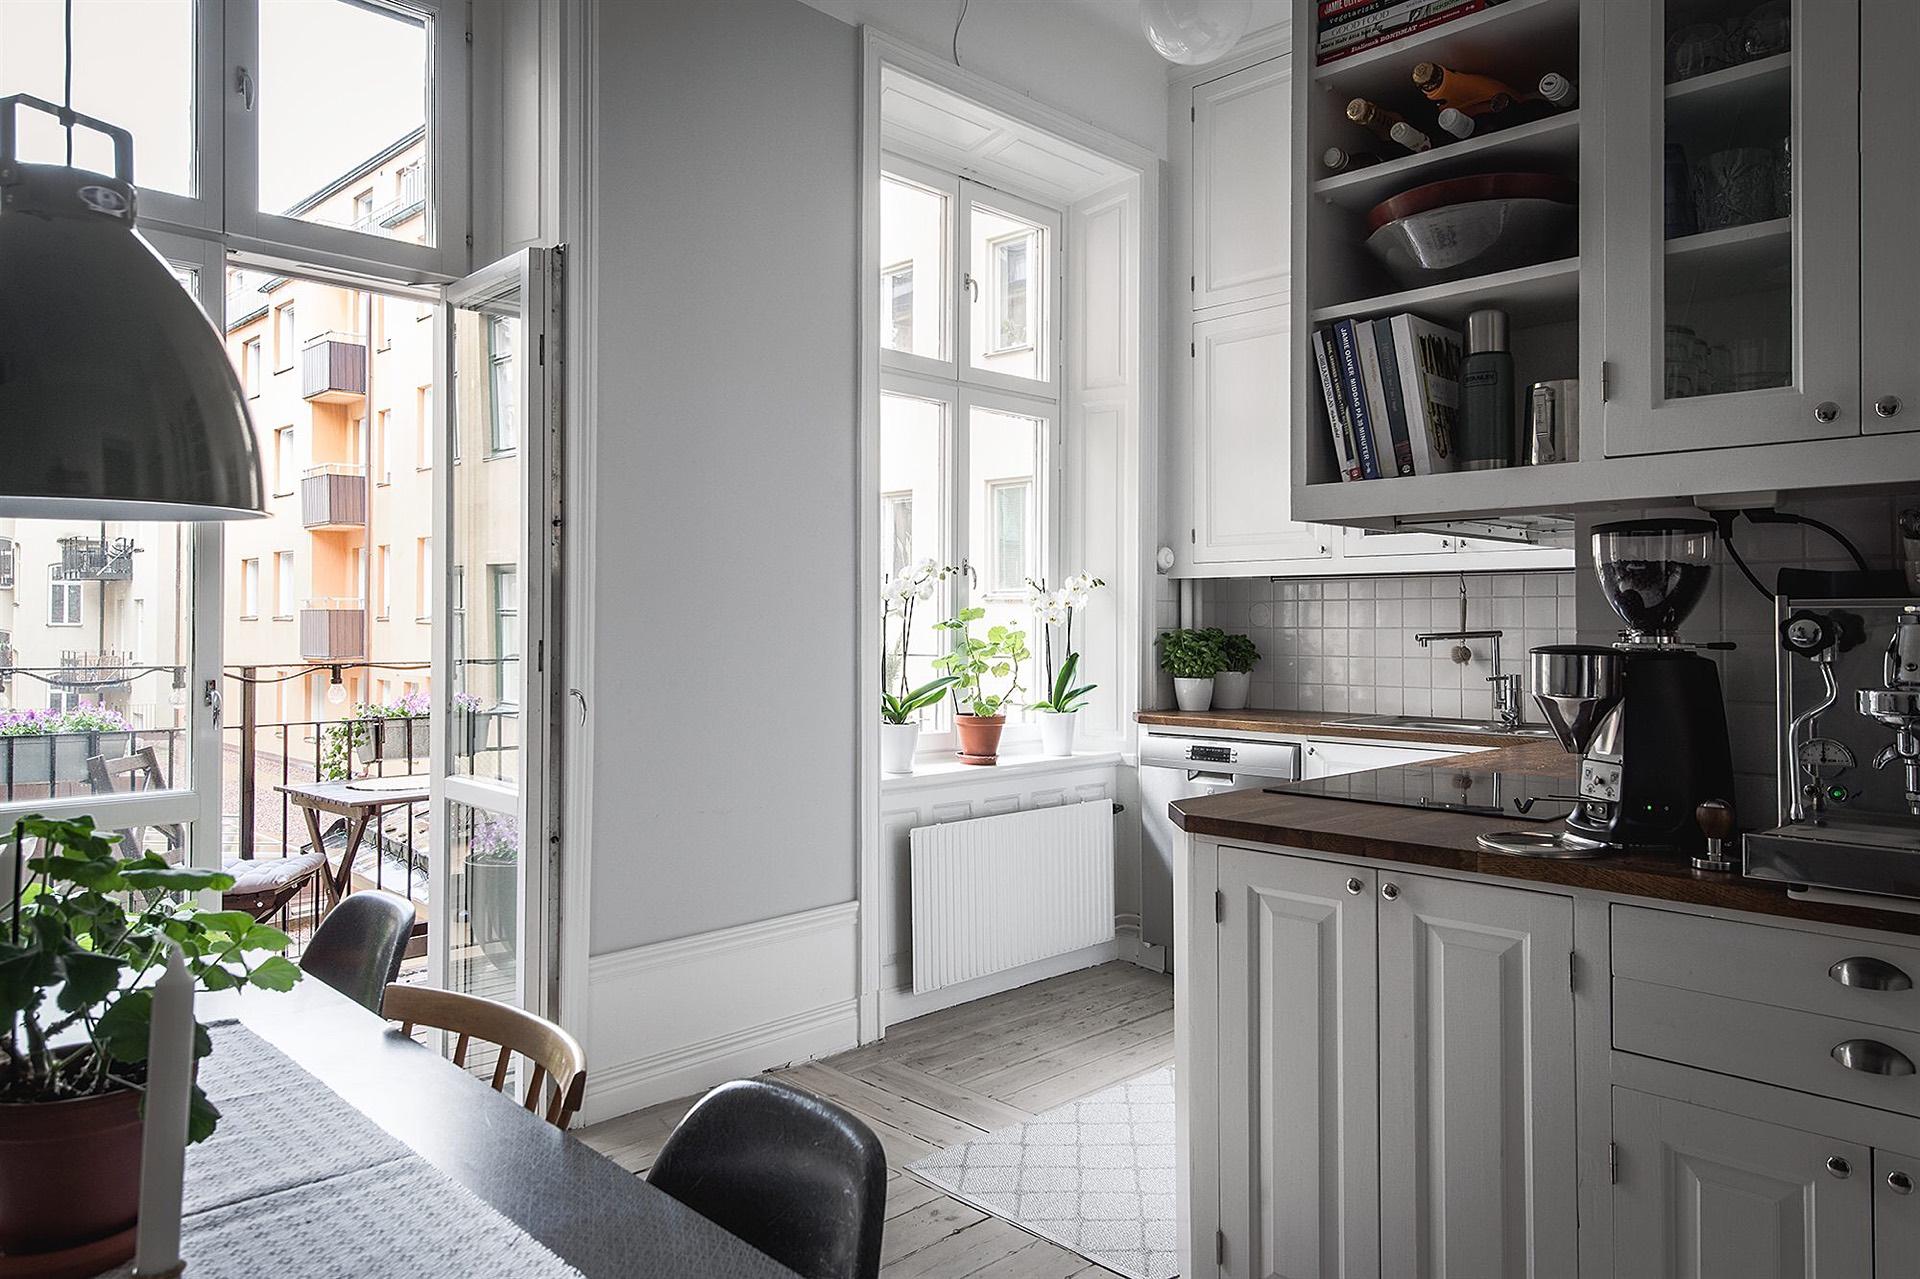 кухня балкон белые фасады филёнка